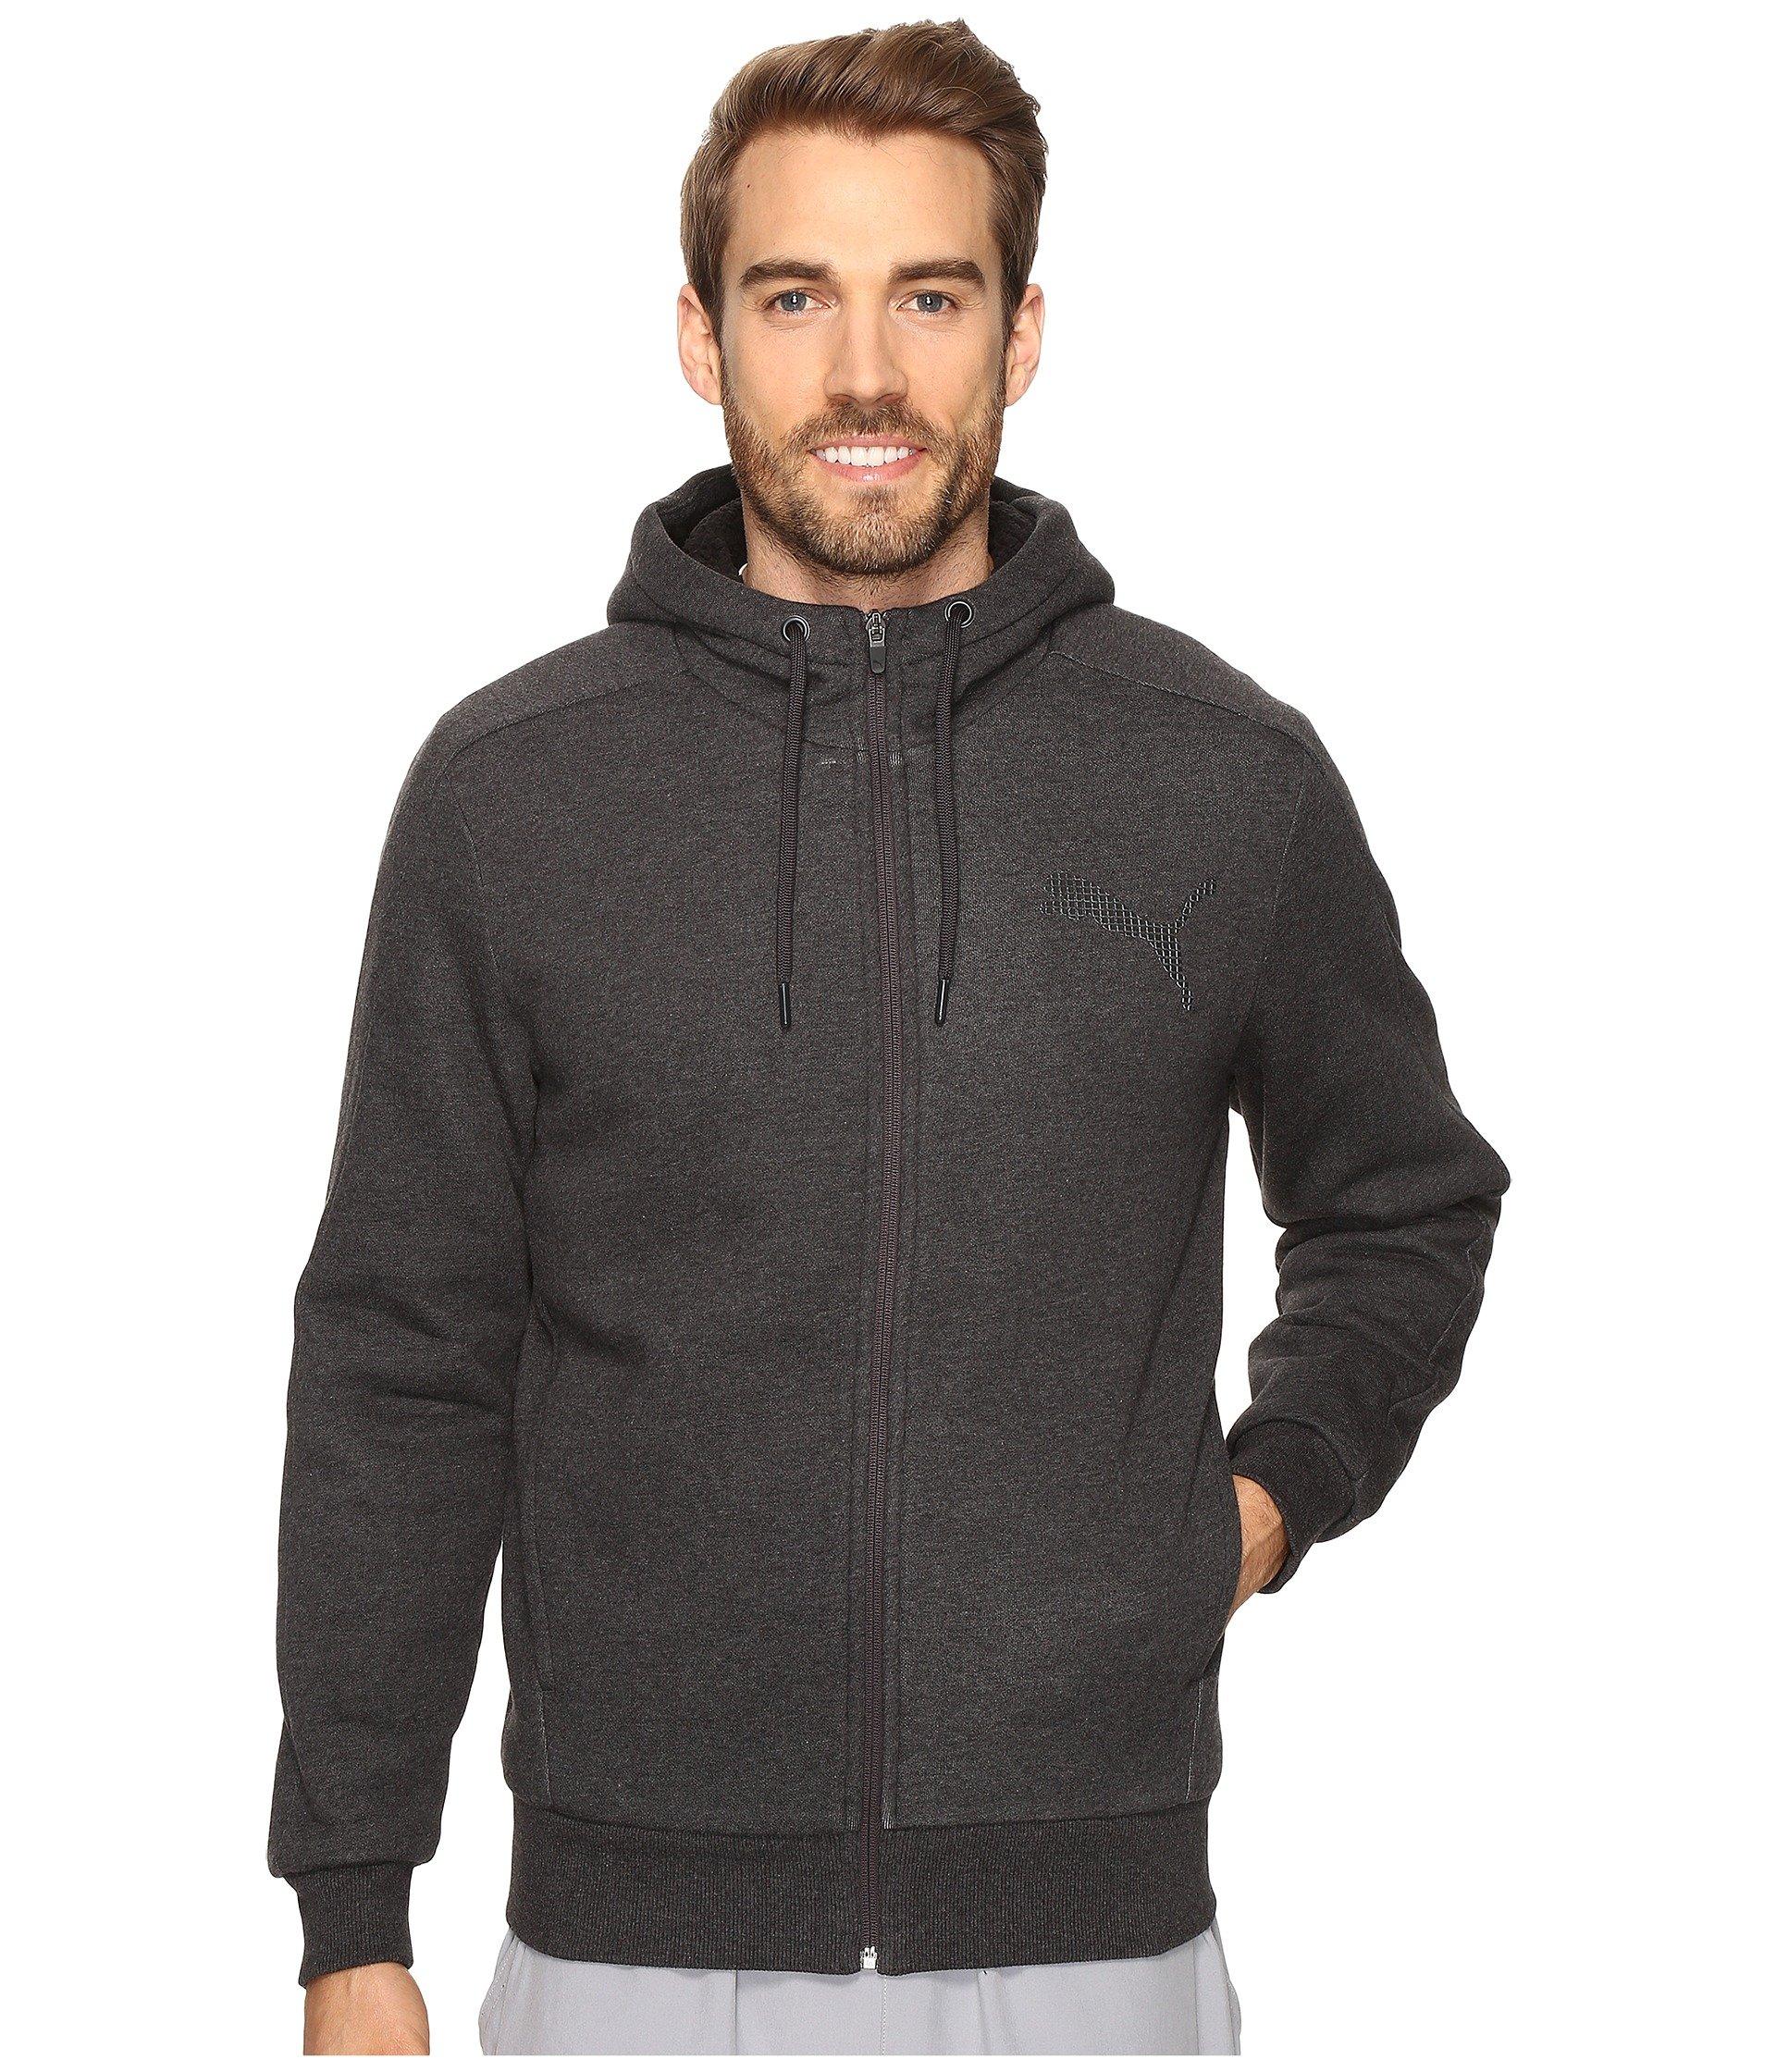 P48 Core Sherpa Full Zip Hoodie